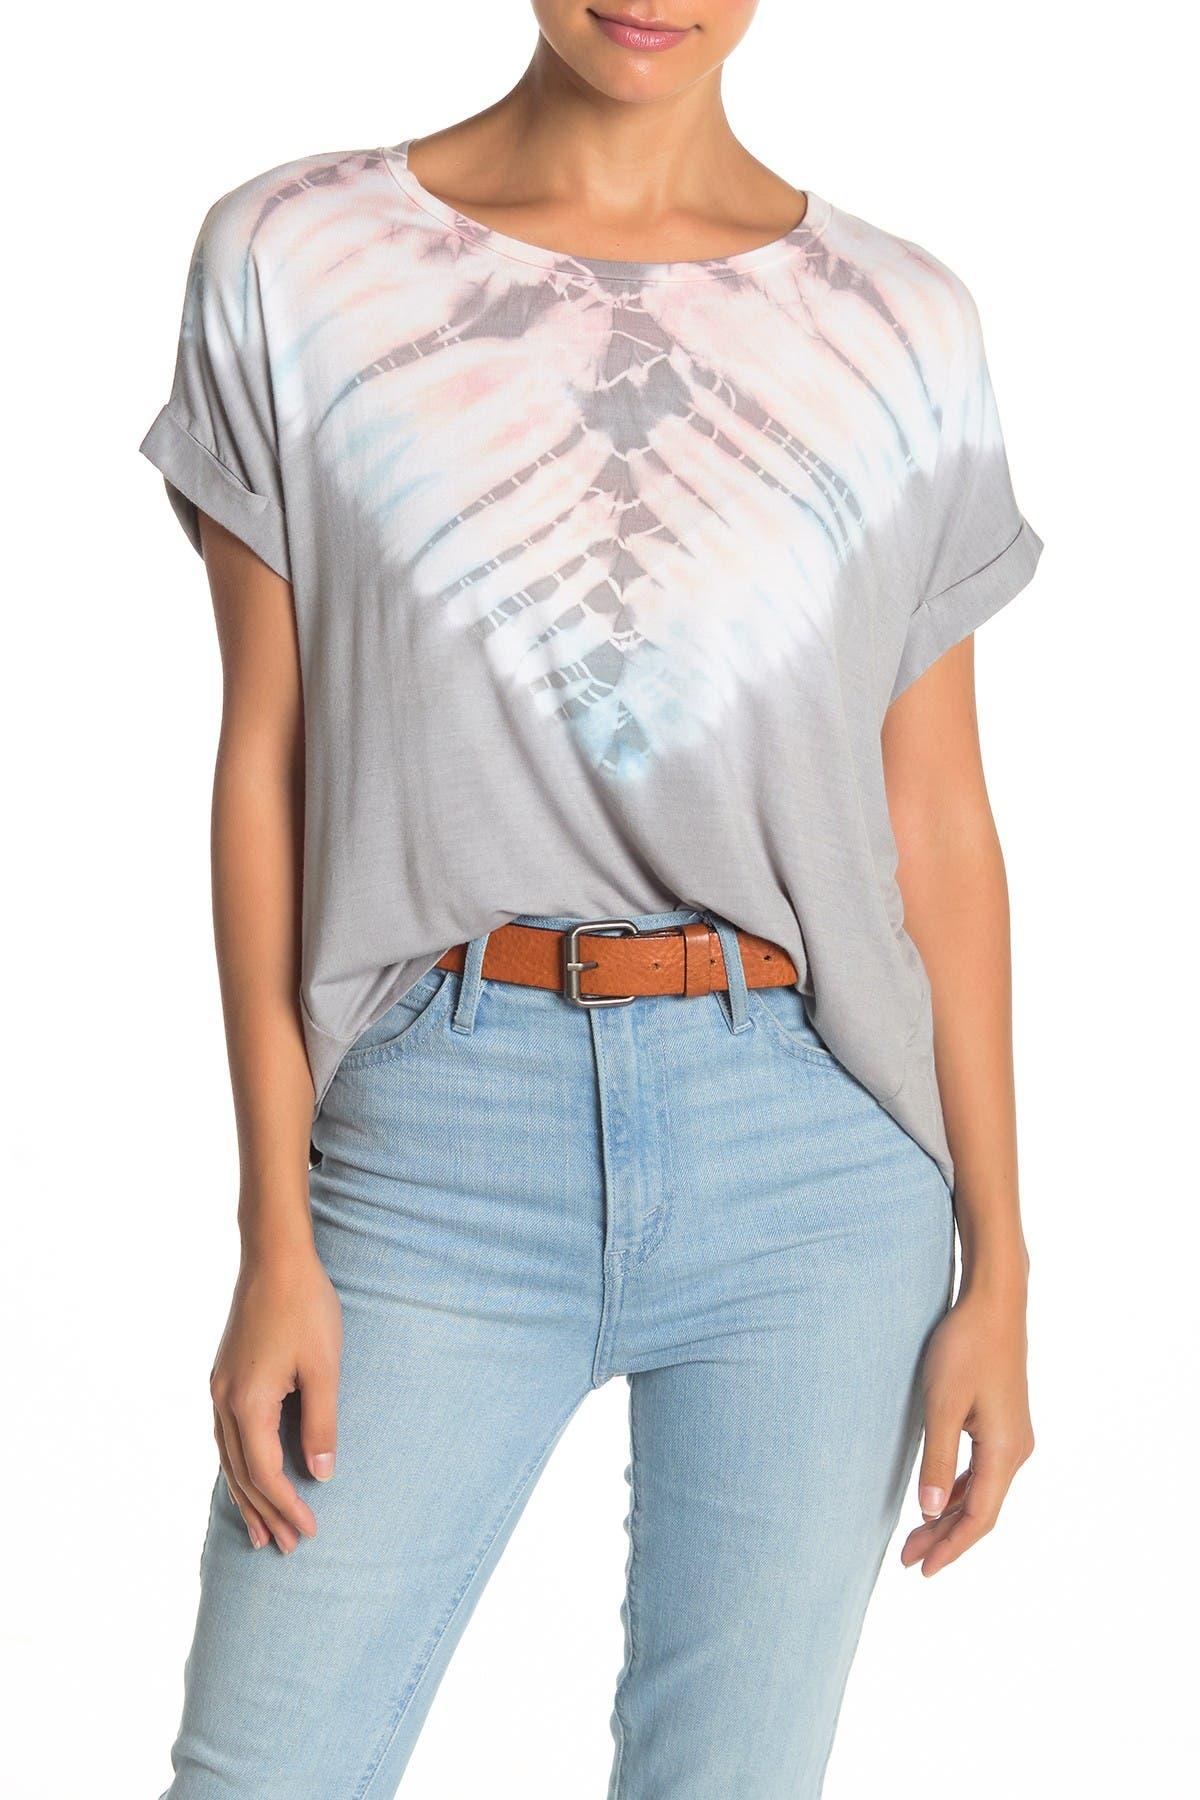 Image of GOOD LUCK GEM Tie Dye Boxy T-Shirt